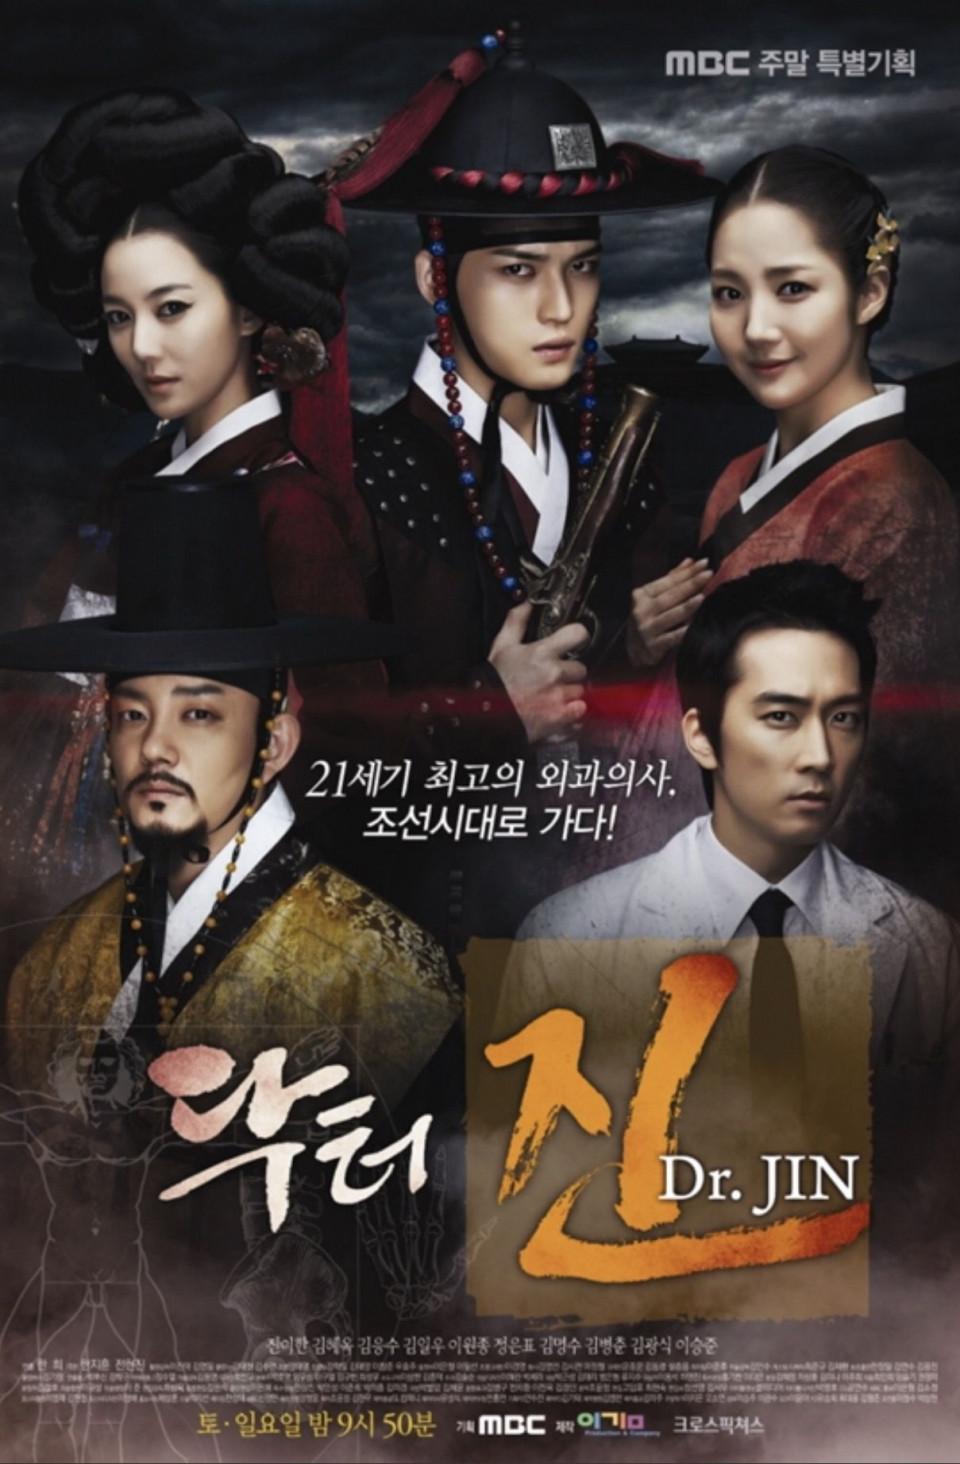 Kurang Laku di Pasaran, 5 Drama Korea Adaptasi Komik Ini Gagal Memikat Penonton - Foto 2